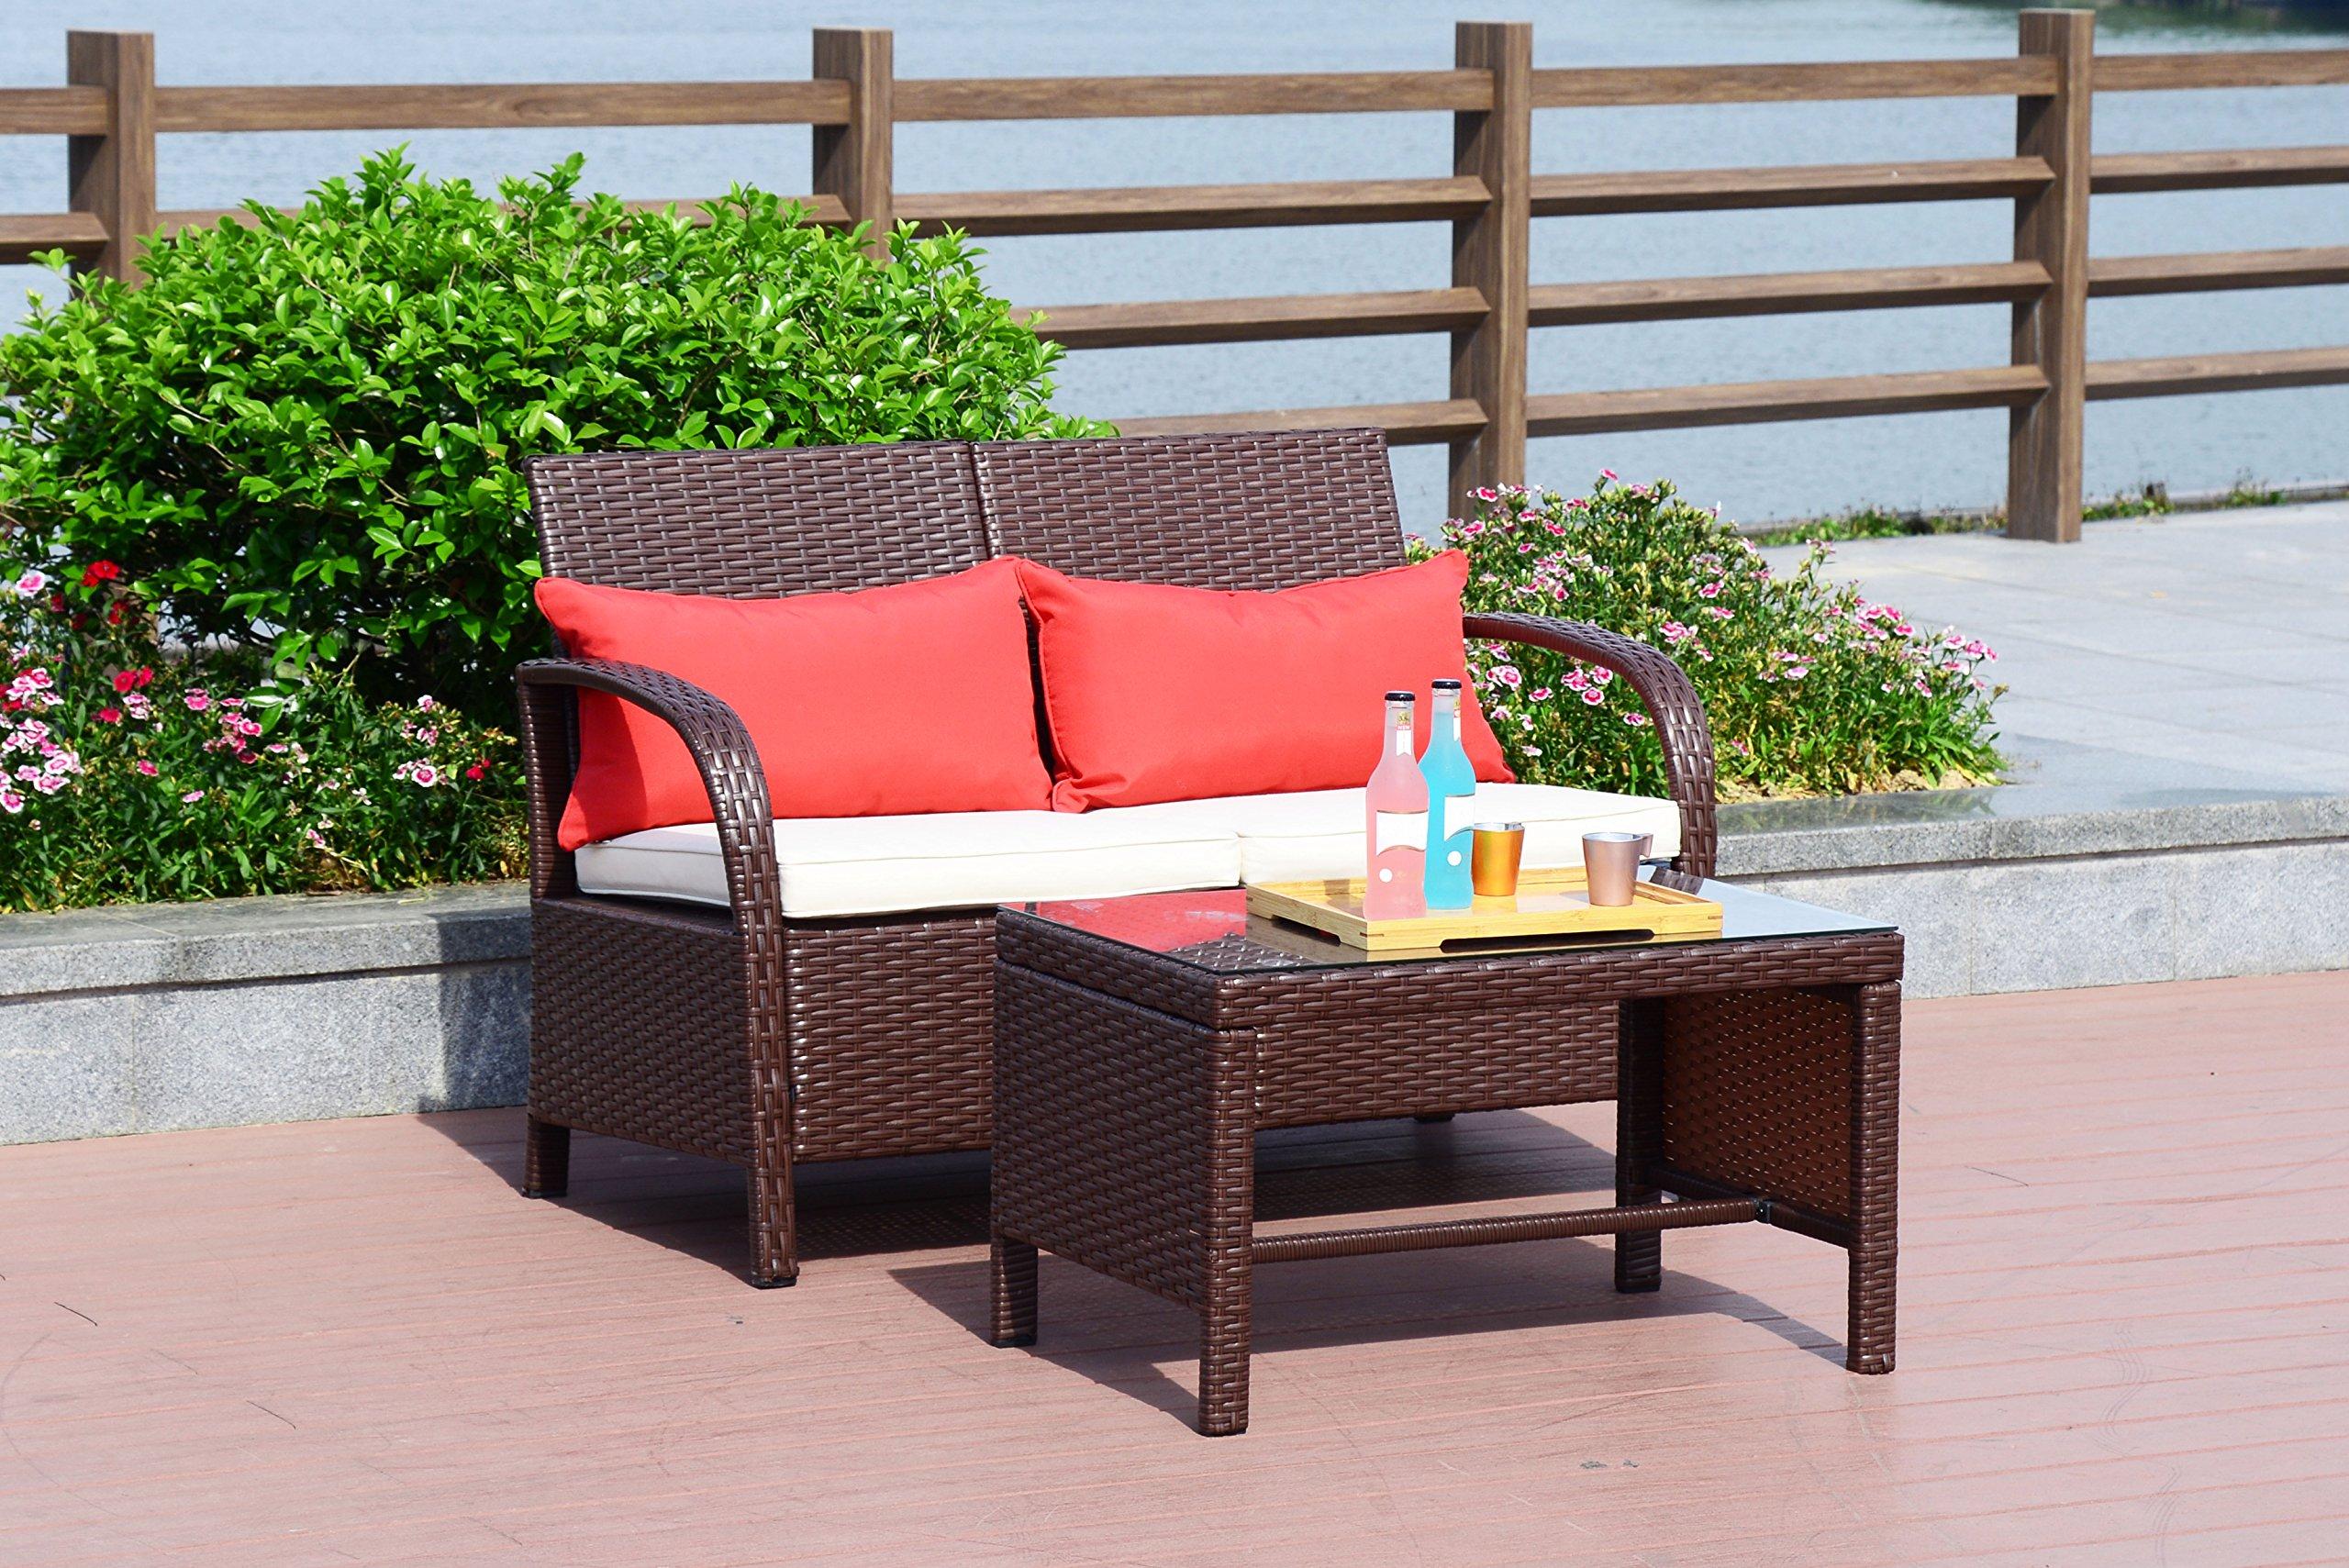 Outdoor Furniture -  -  - 91G8tOg%2B mL -